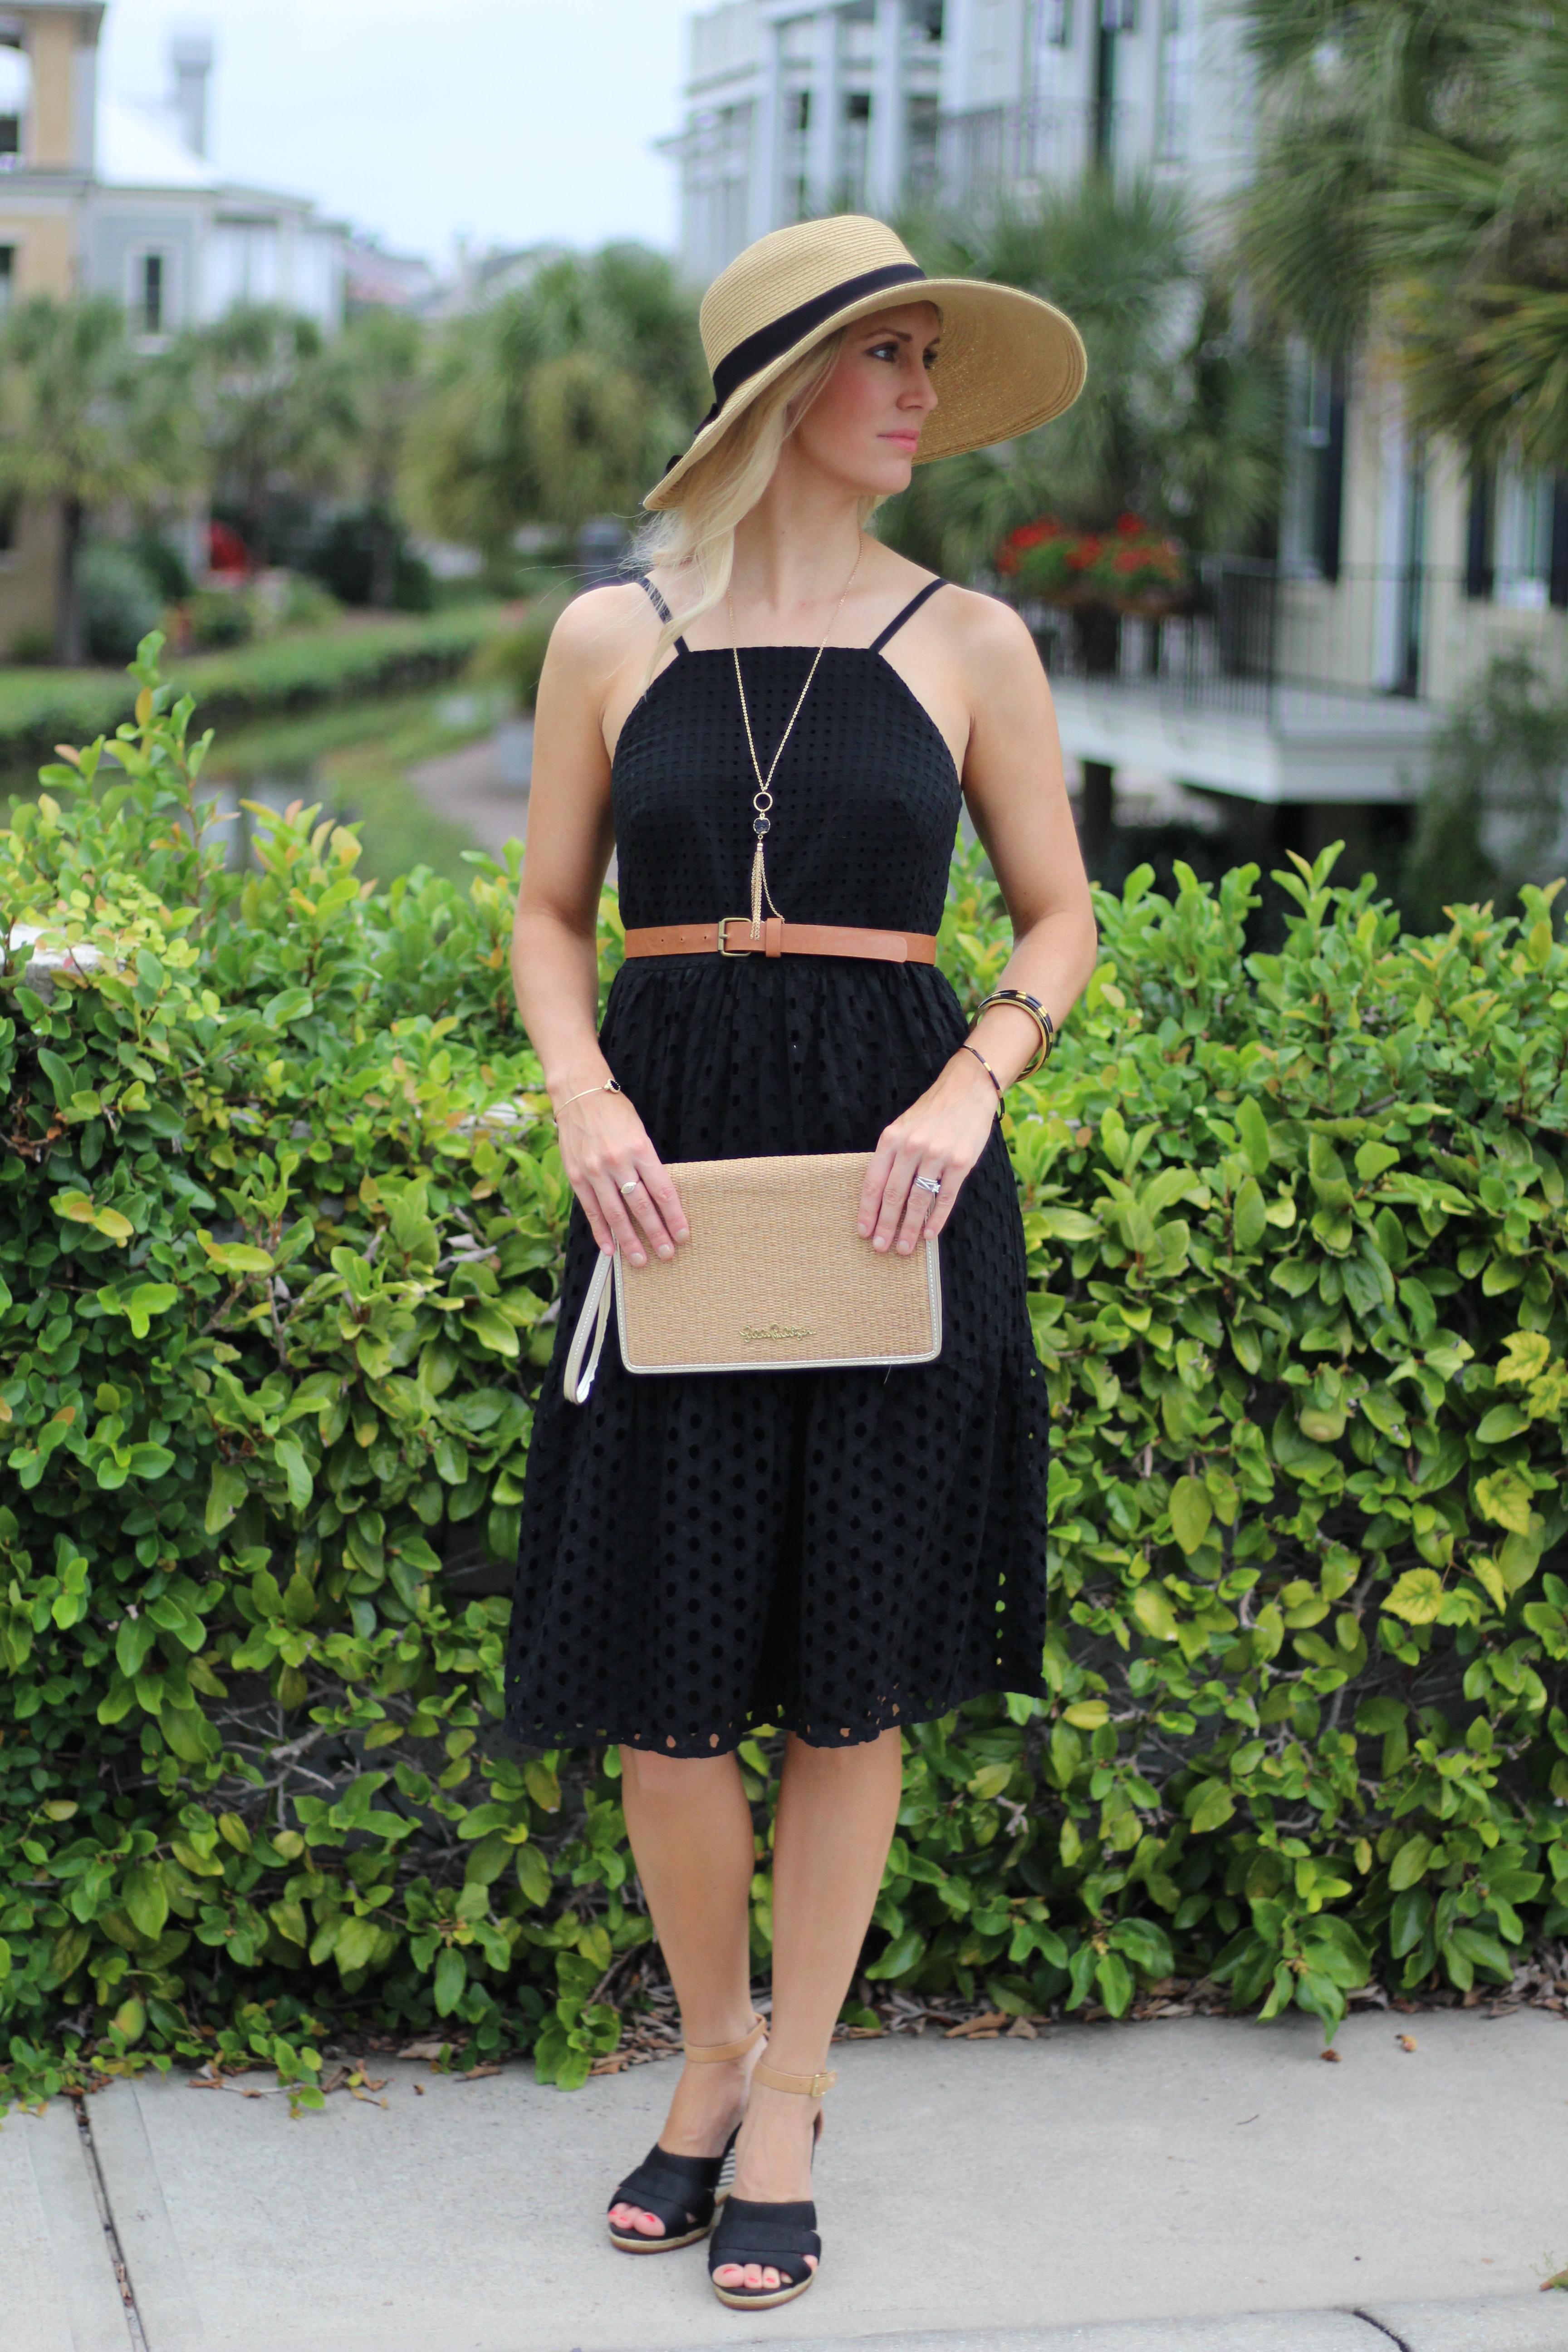 allison-cawley-little-black-dress-1